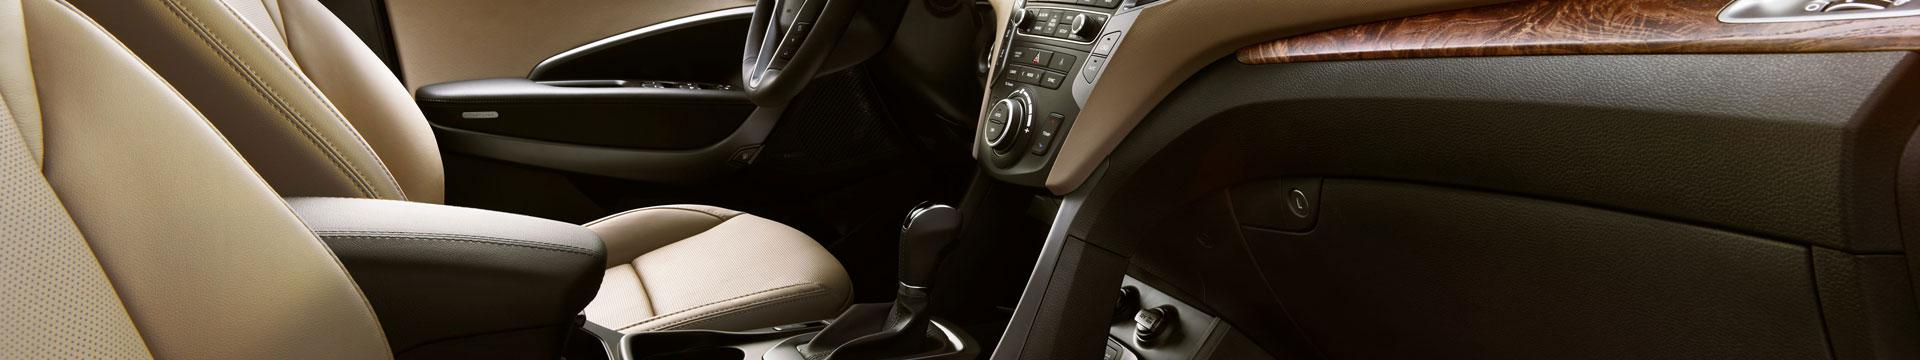 Hyundai Automatic Transmission Service; Hyundai Automatic Transmission Service Downey, CA